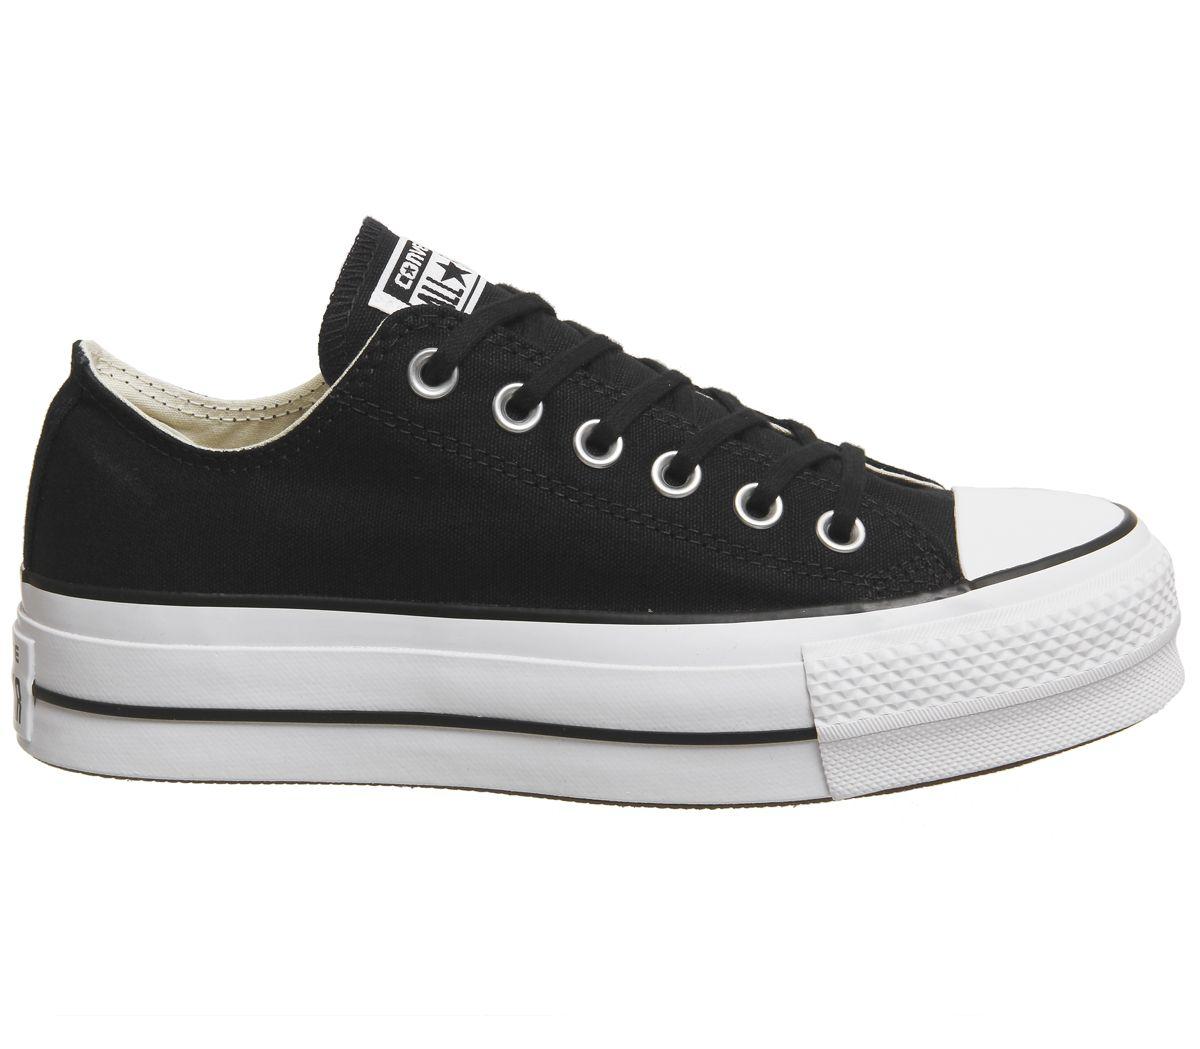 924767c9e786 Sentinel Womens Converse All Star Low Platform Black Black White Trainers  Shoes